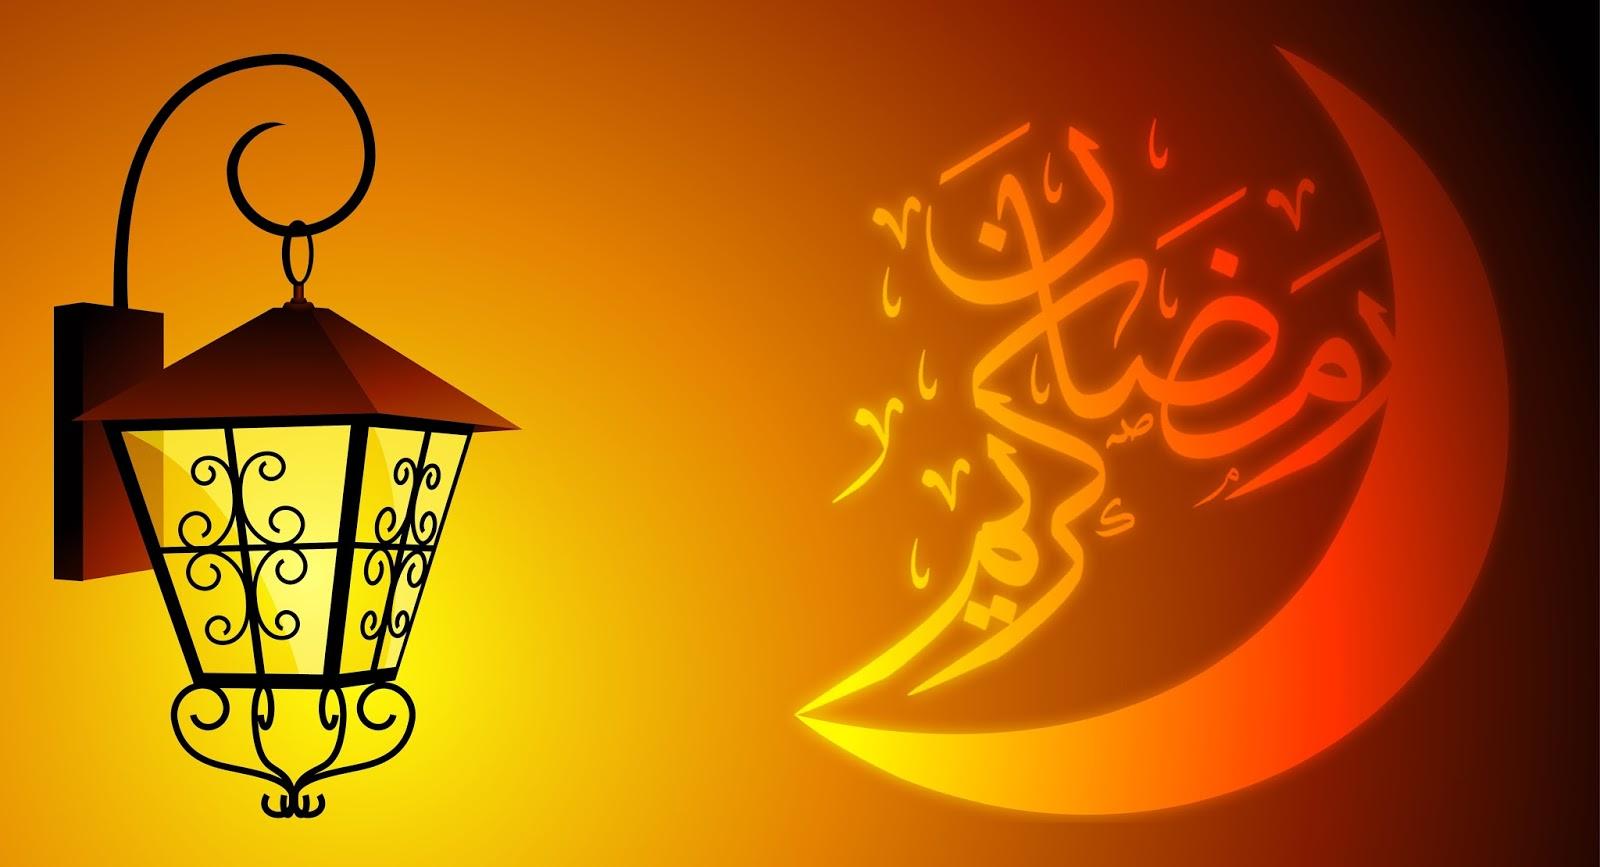 Ramadan 2016 ramadan greetings eid al fitr 2016 quotes ramadan ramadan 2016 greetings quotes cards messages kristyandbryce Choice Image